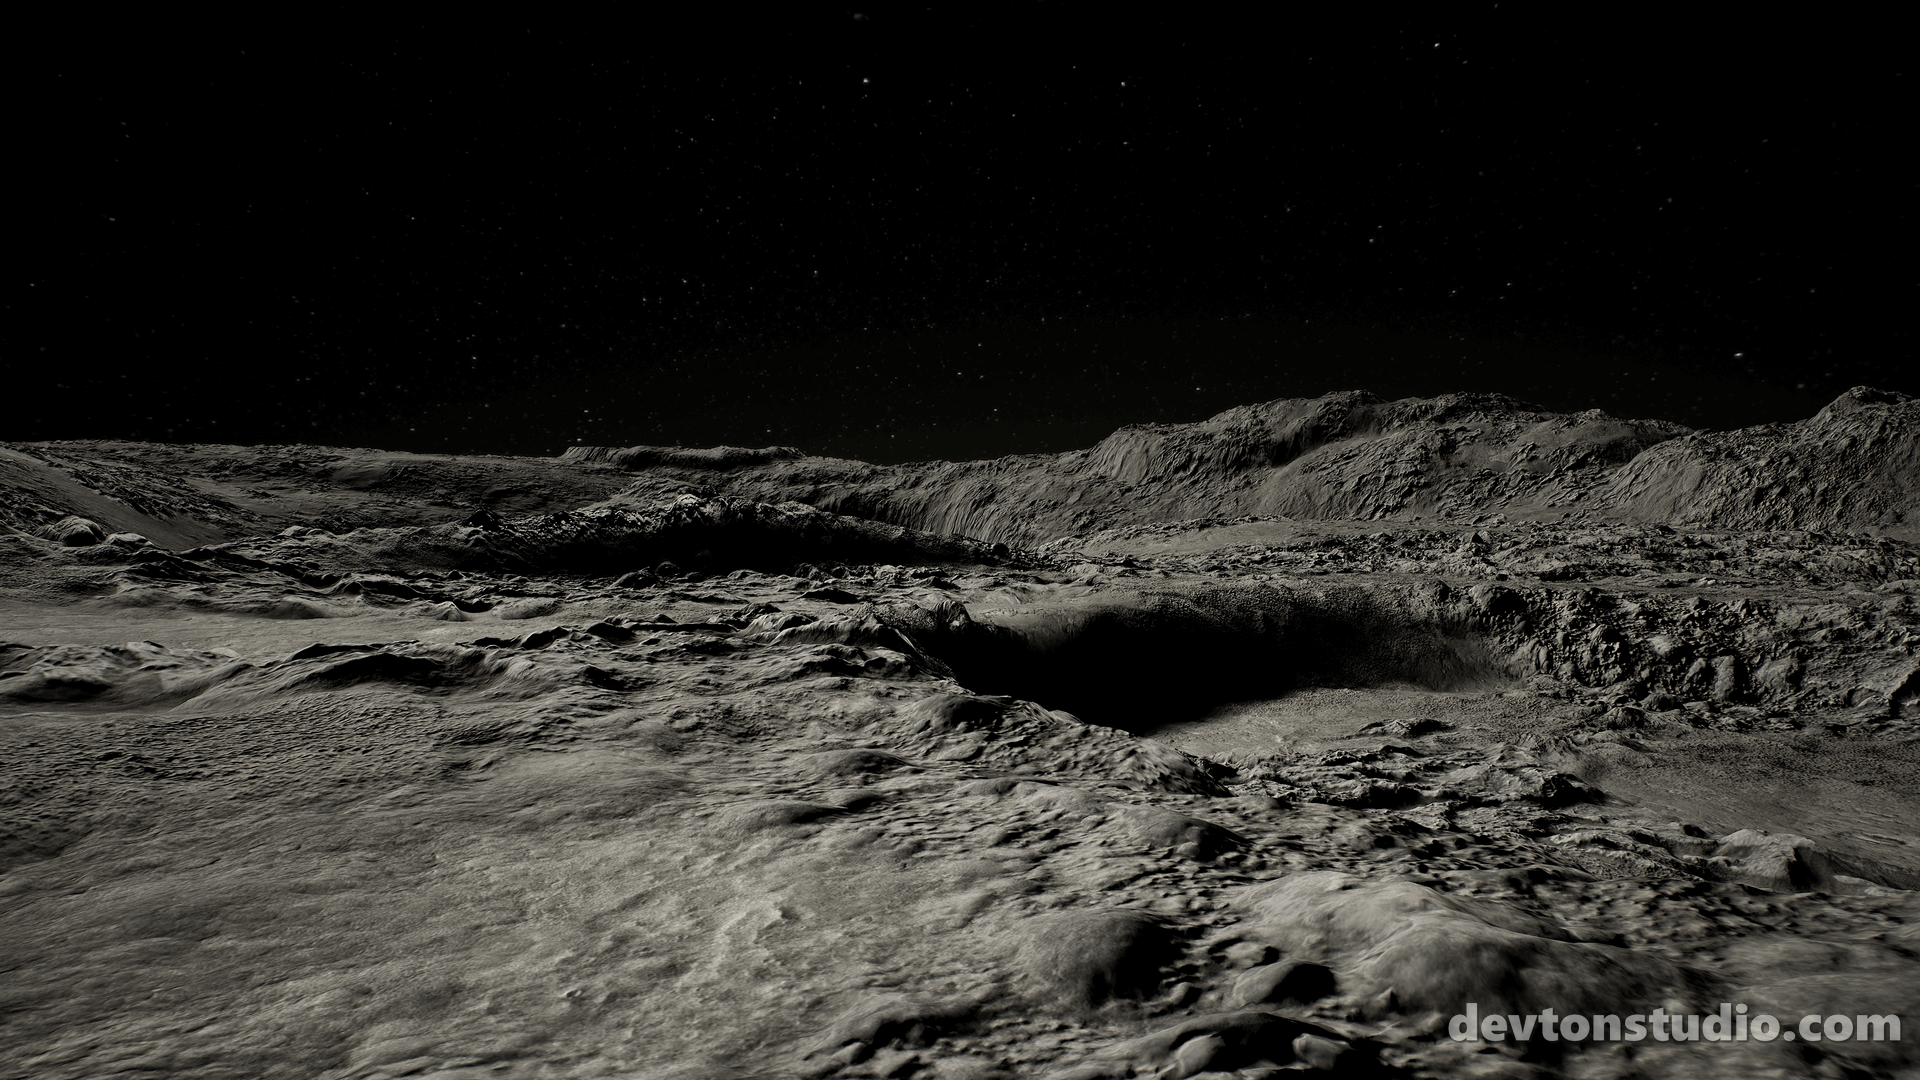 Moon Landscape By DevTon Studio In Environments